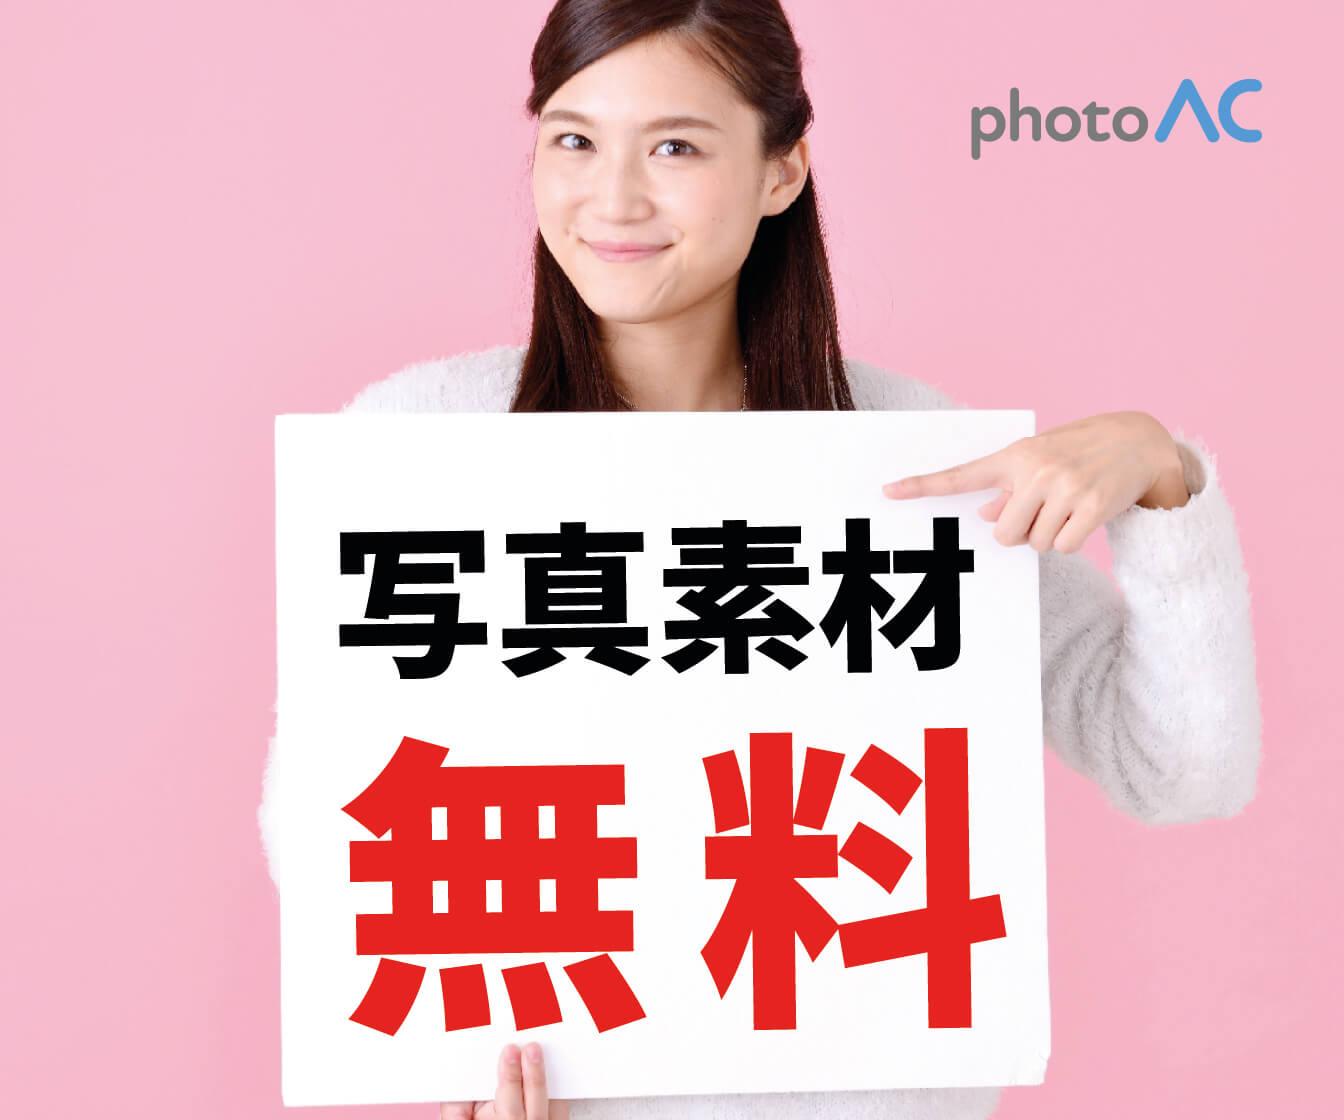 【PR】高解像度の写真素材なら【写真AC】